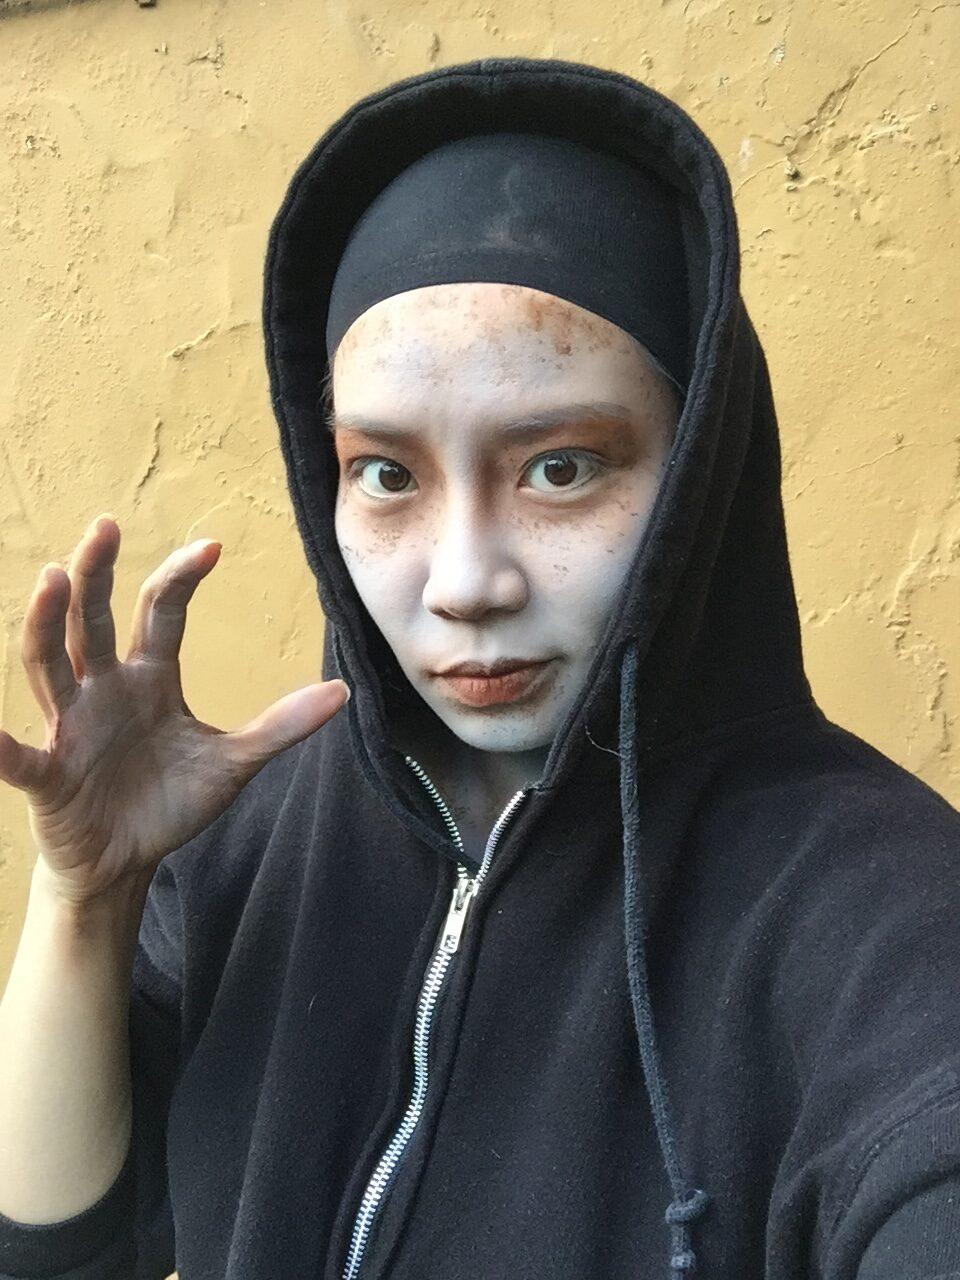 Vivian Ahn IMG 4470 rotated